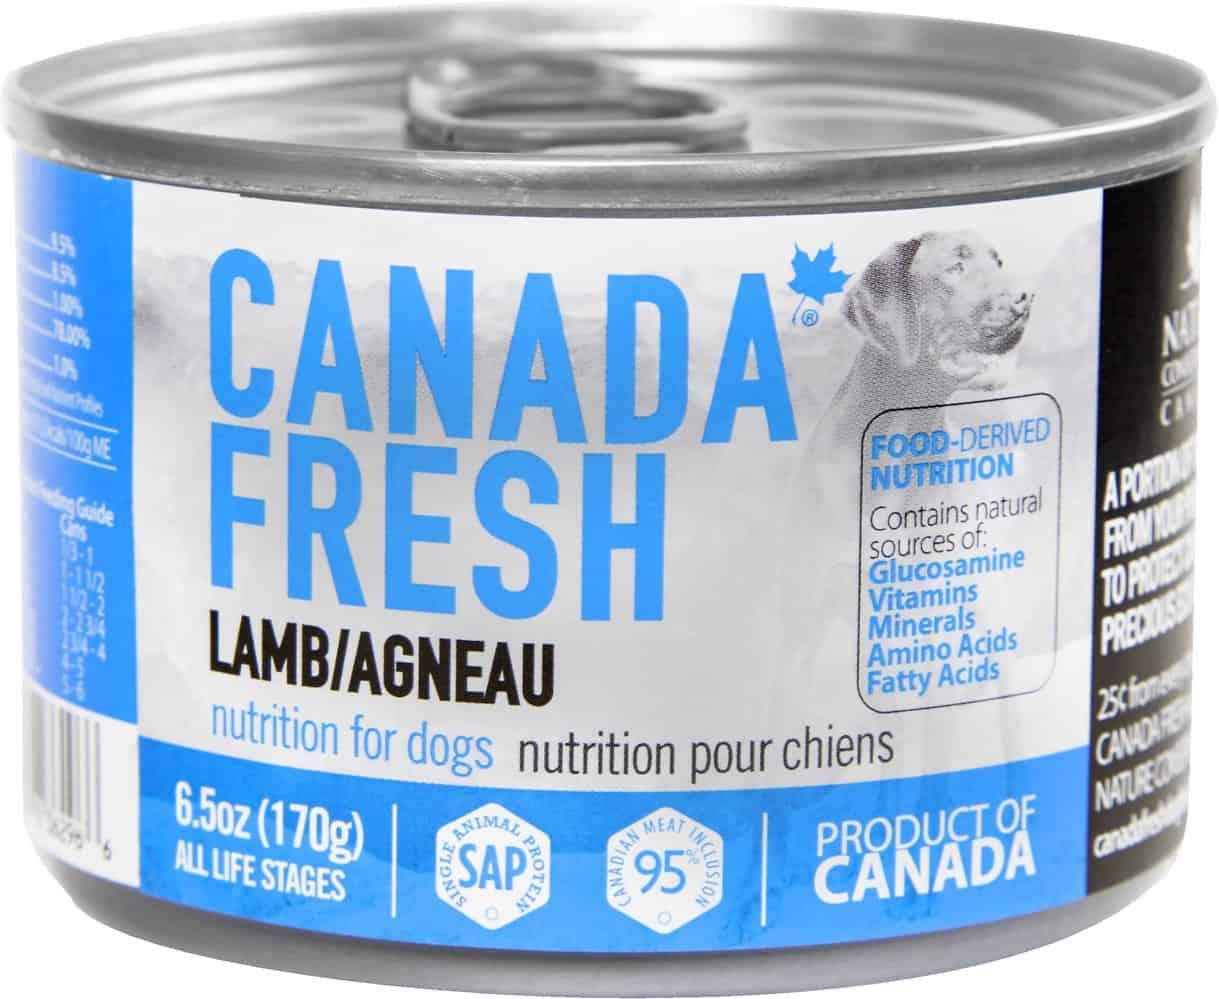 Canada Fresh Dog Food Reviews, Recalls & Coupons [year] 10